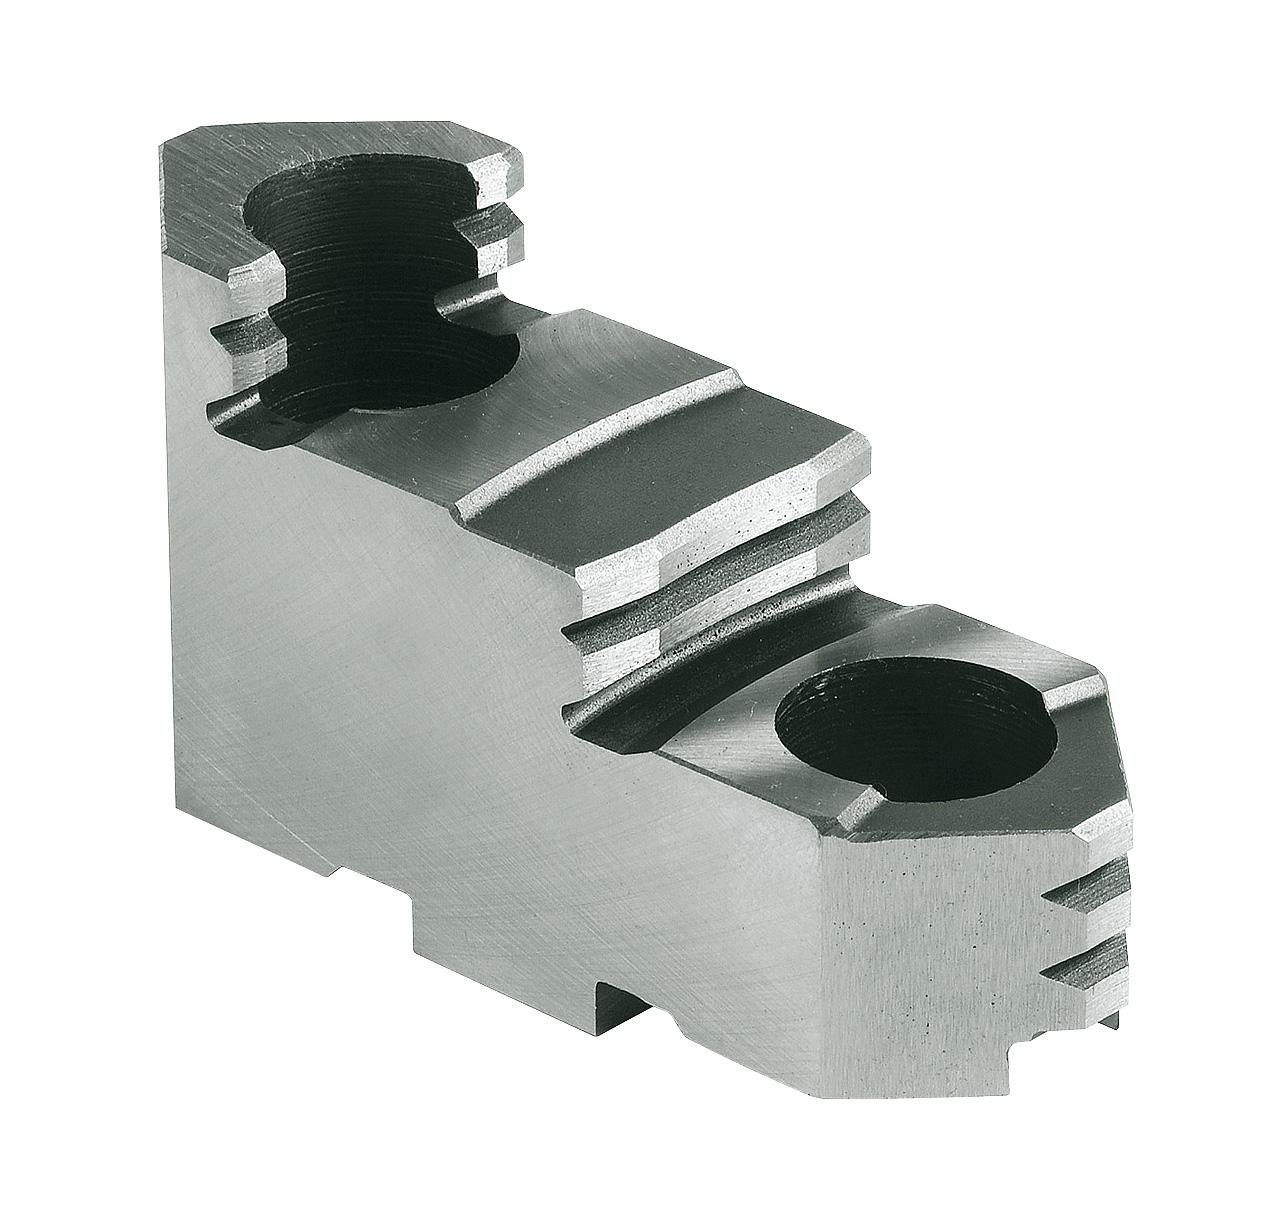 Szczęki górne twarde - komplet TJ-PS4-200 BERNARDO